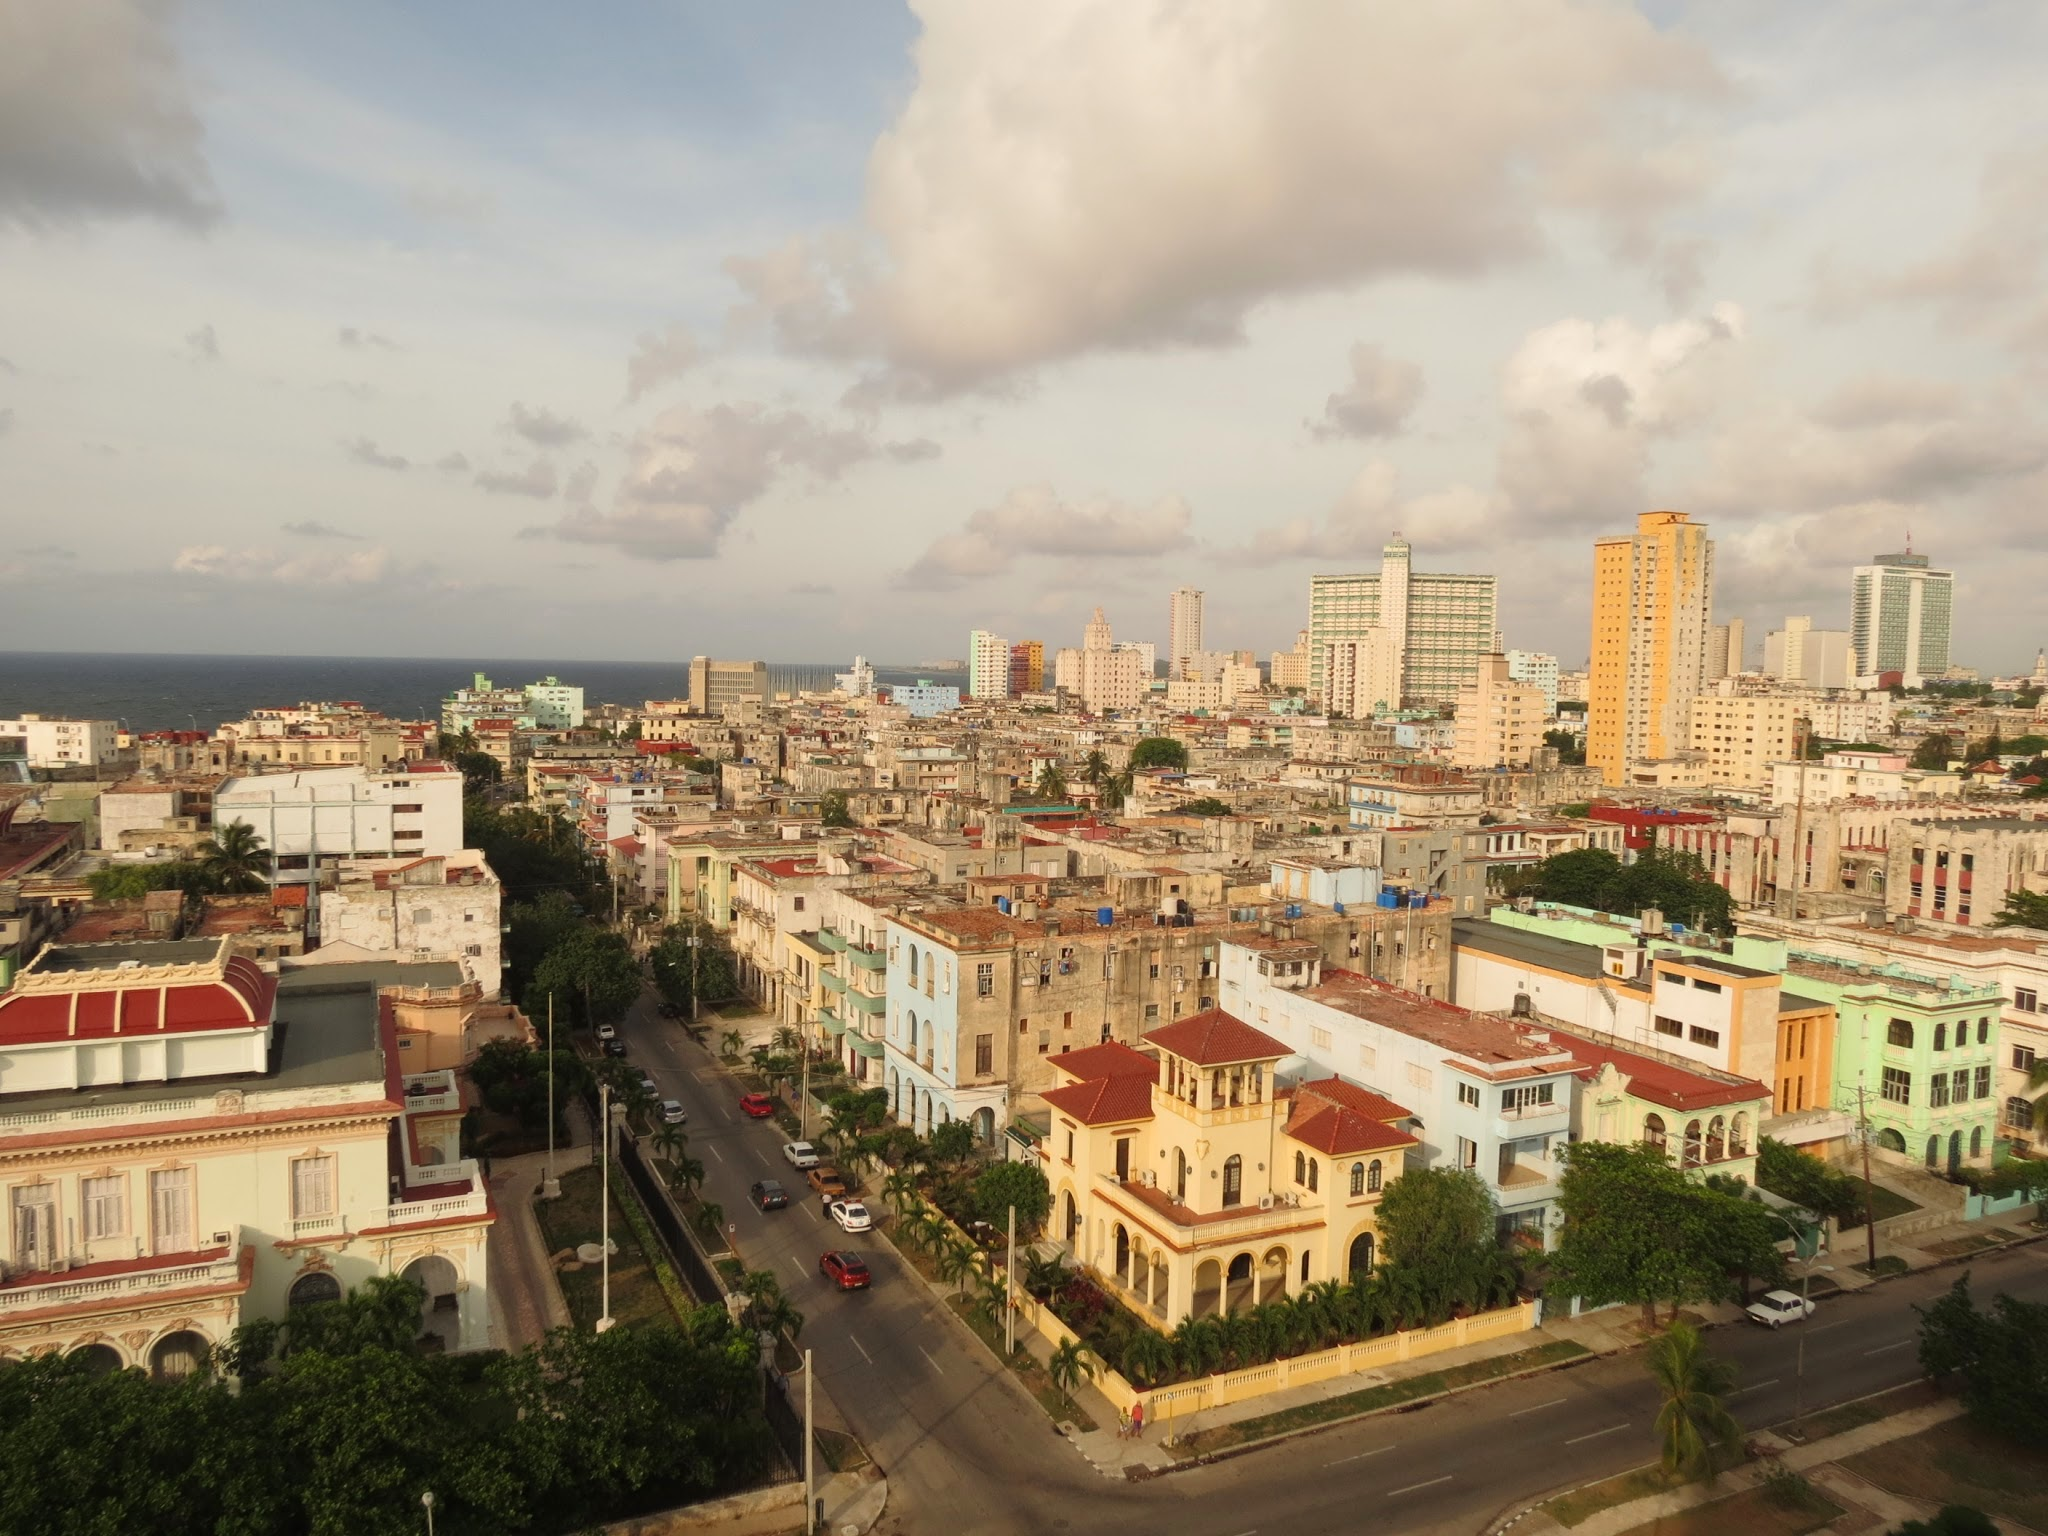 A stunning view of Havana, Cuba from my hotel room window.